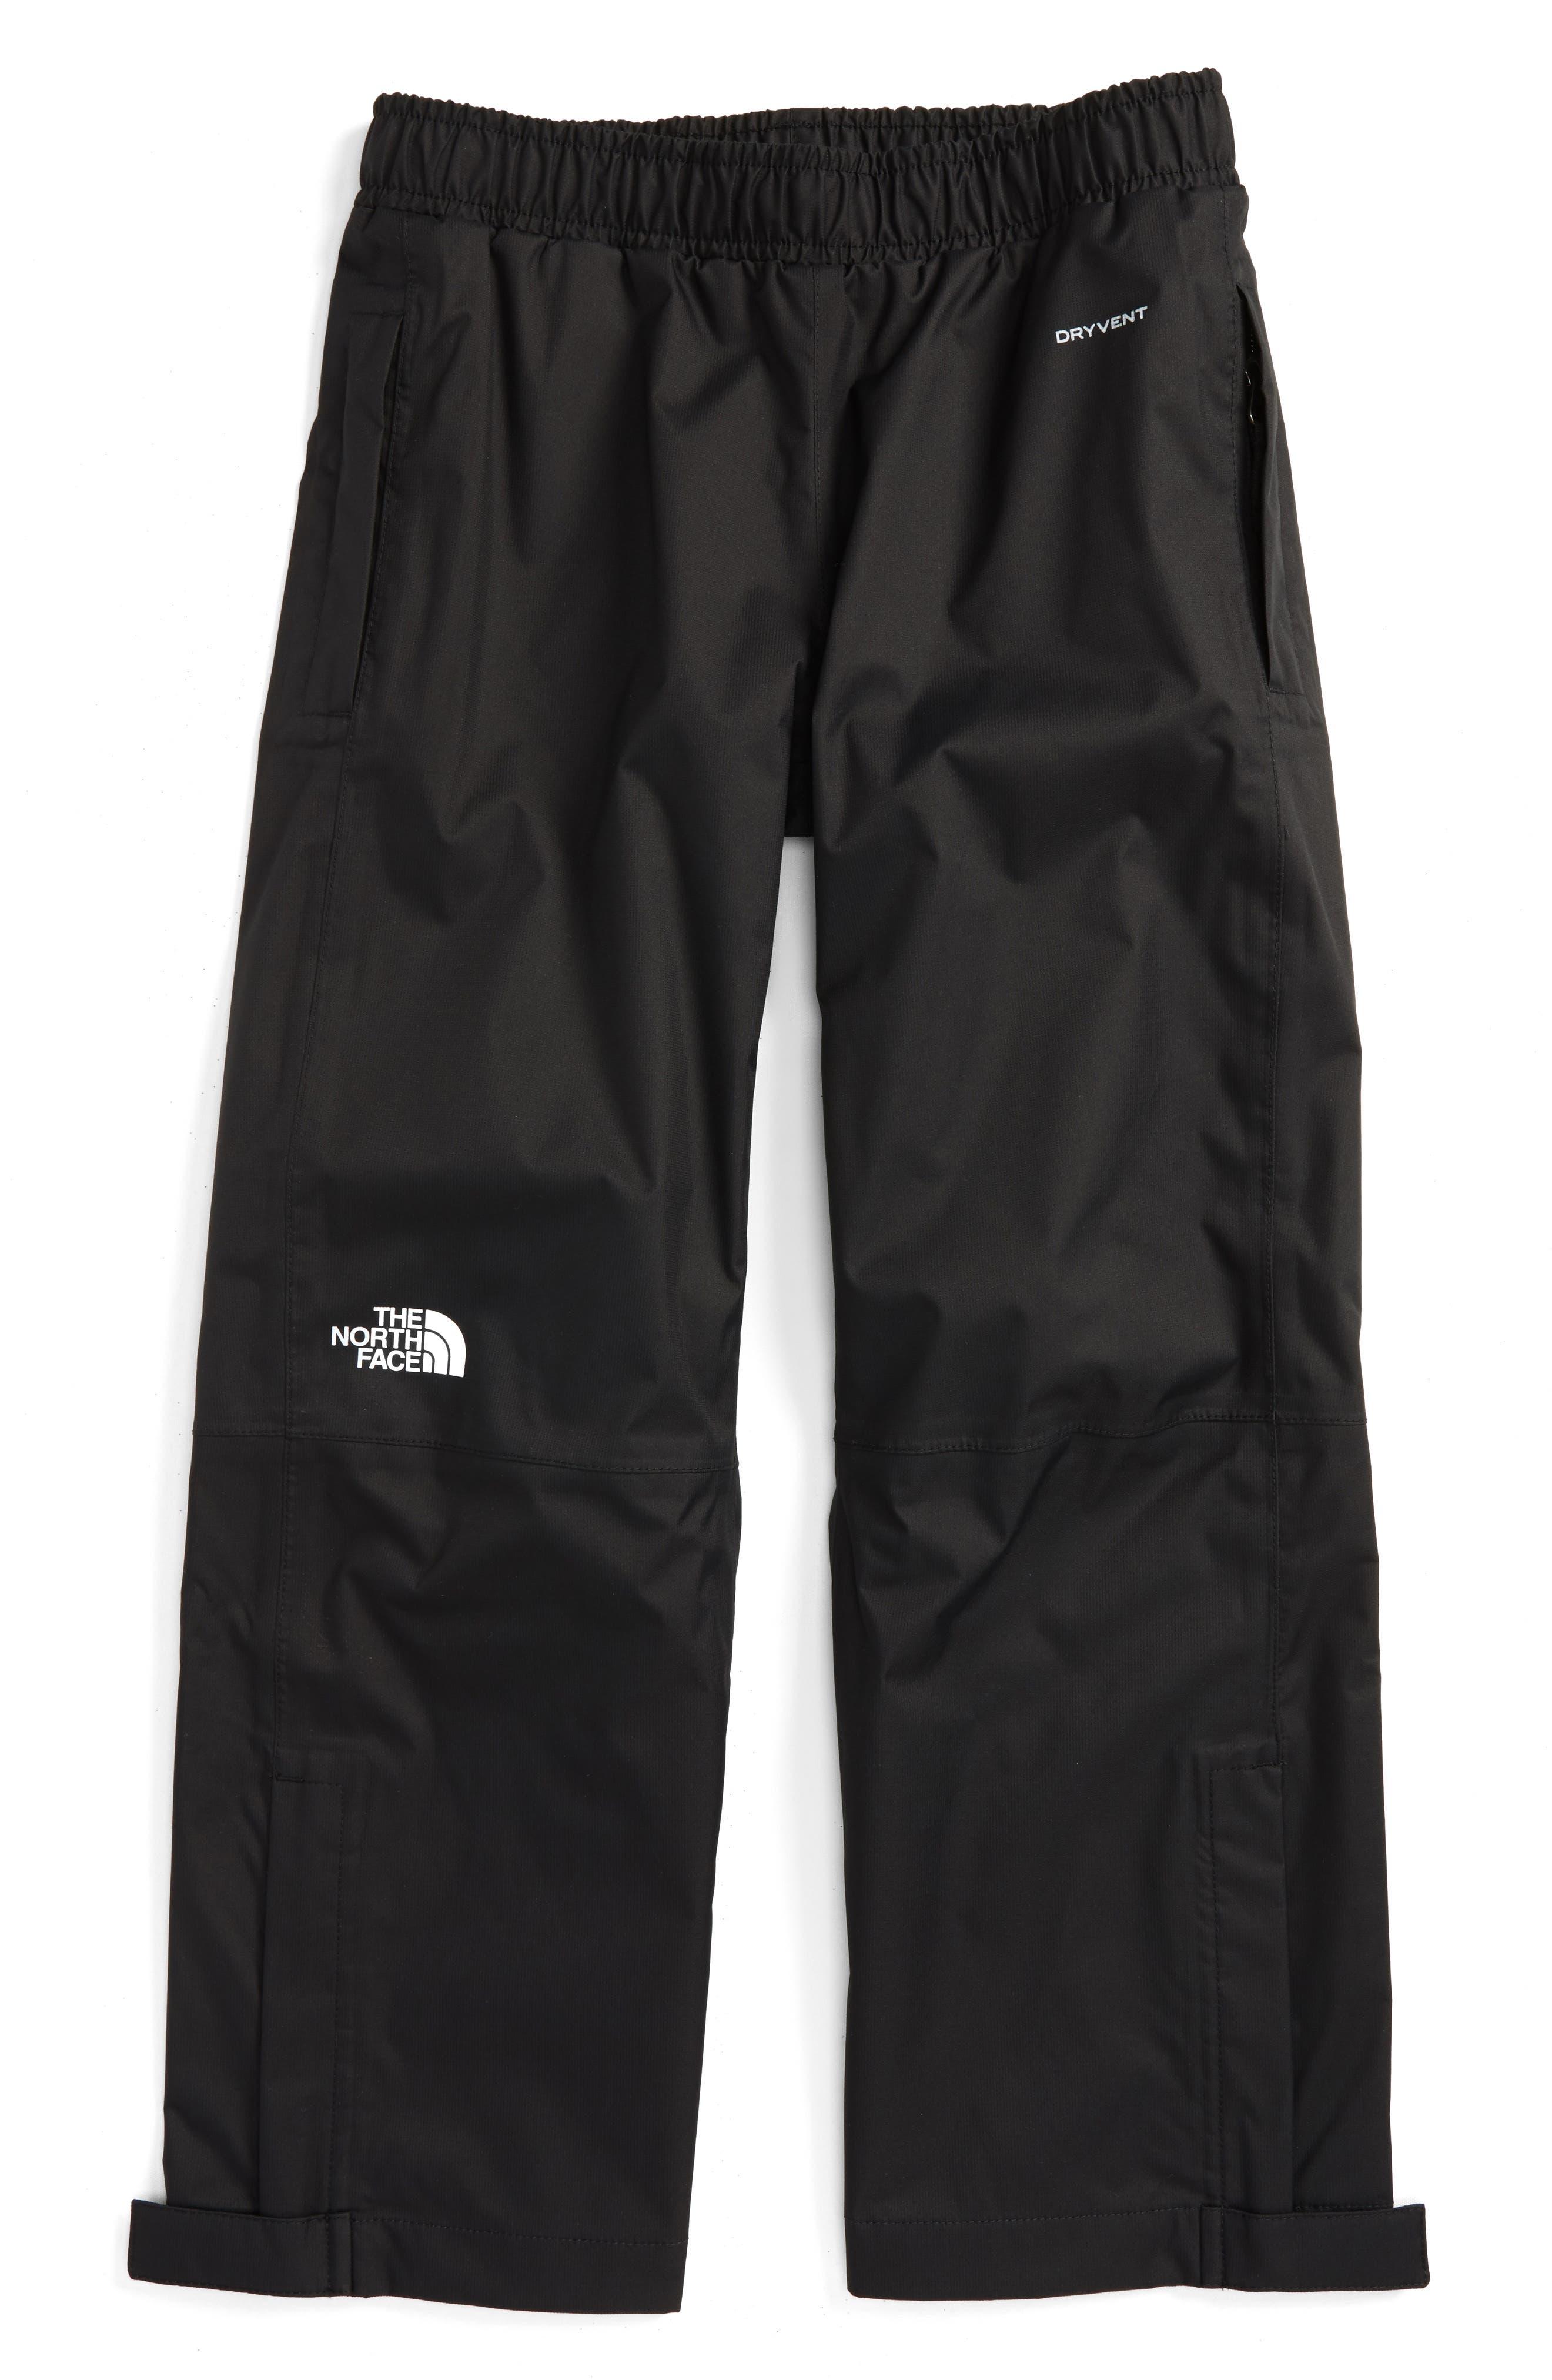 Main Image - The North Face 'Resolve' Waterproof Rain Pants (Little Boys)